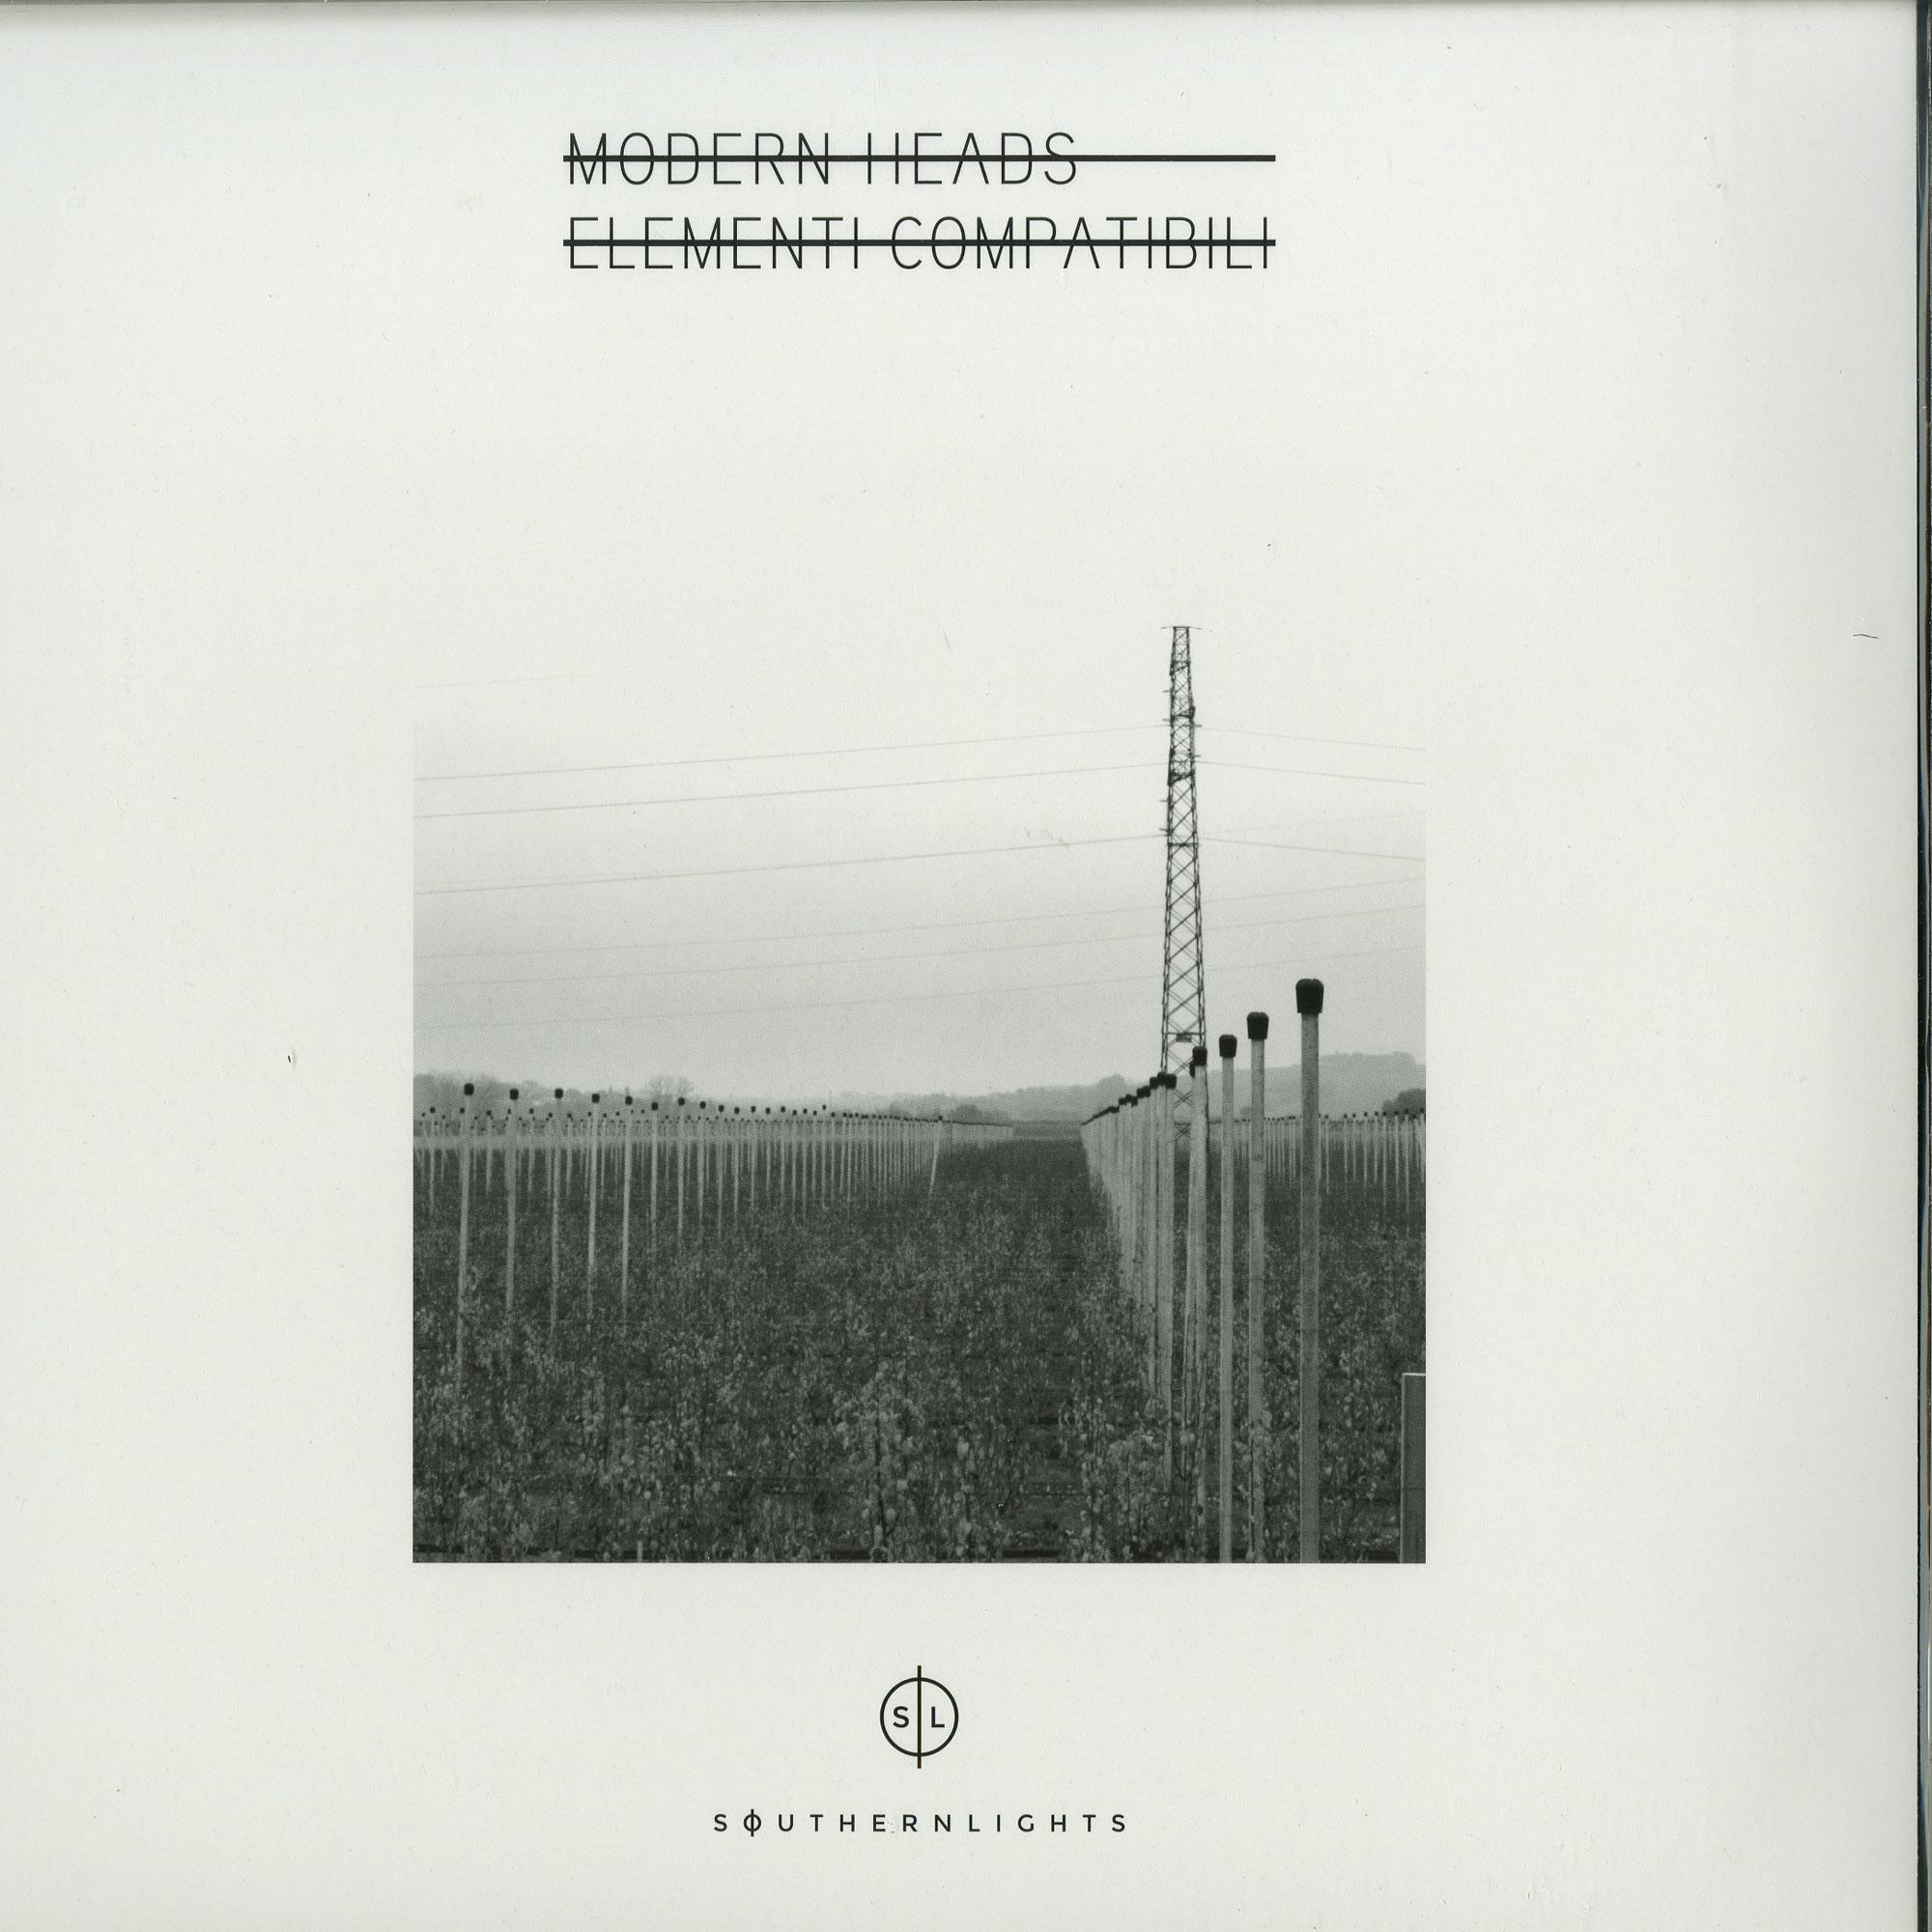 Modern Heads - ELEMENTI COMPATIBILI EP